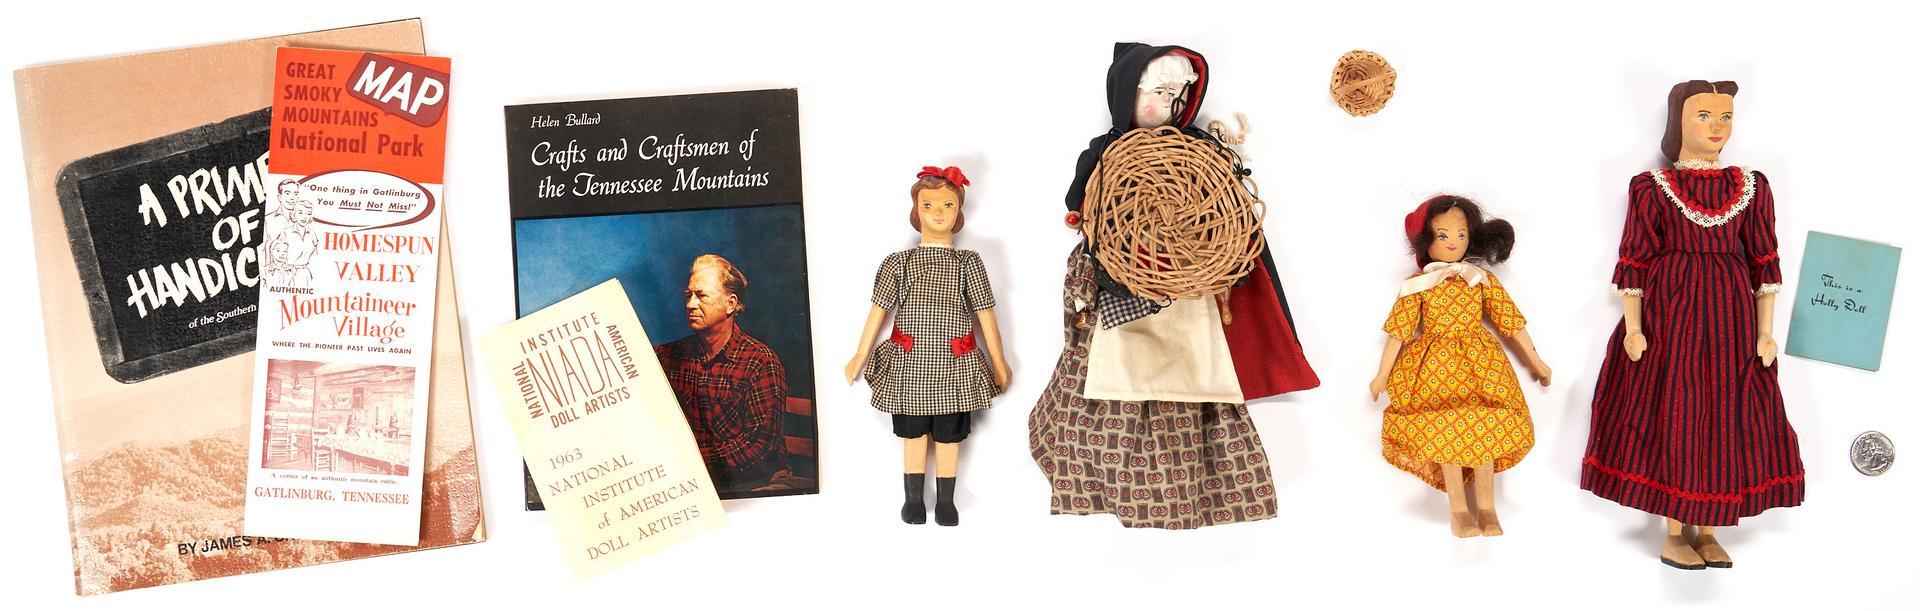 Lot 1062: 4 Folk Art Female Dolls, incl. 2 Helen Bullard